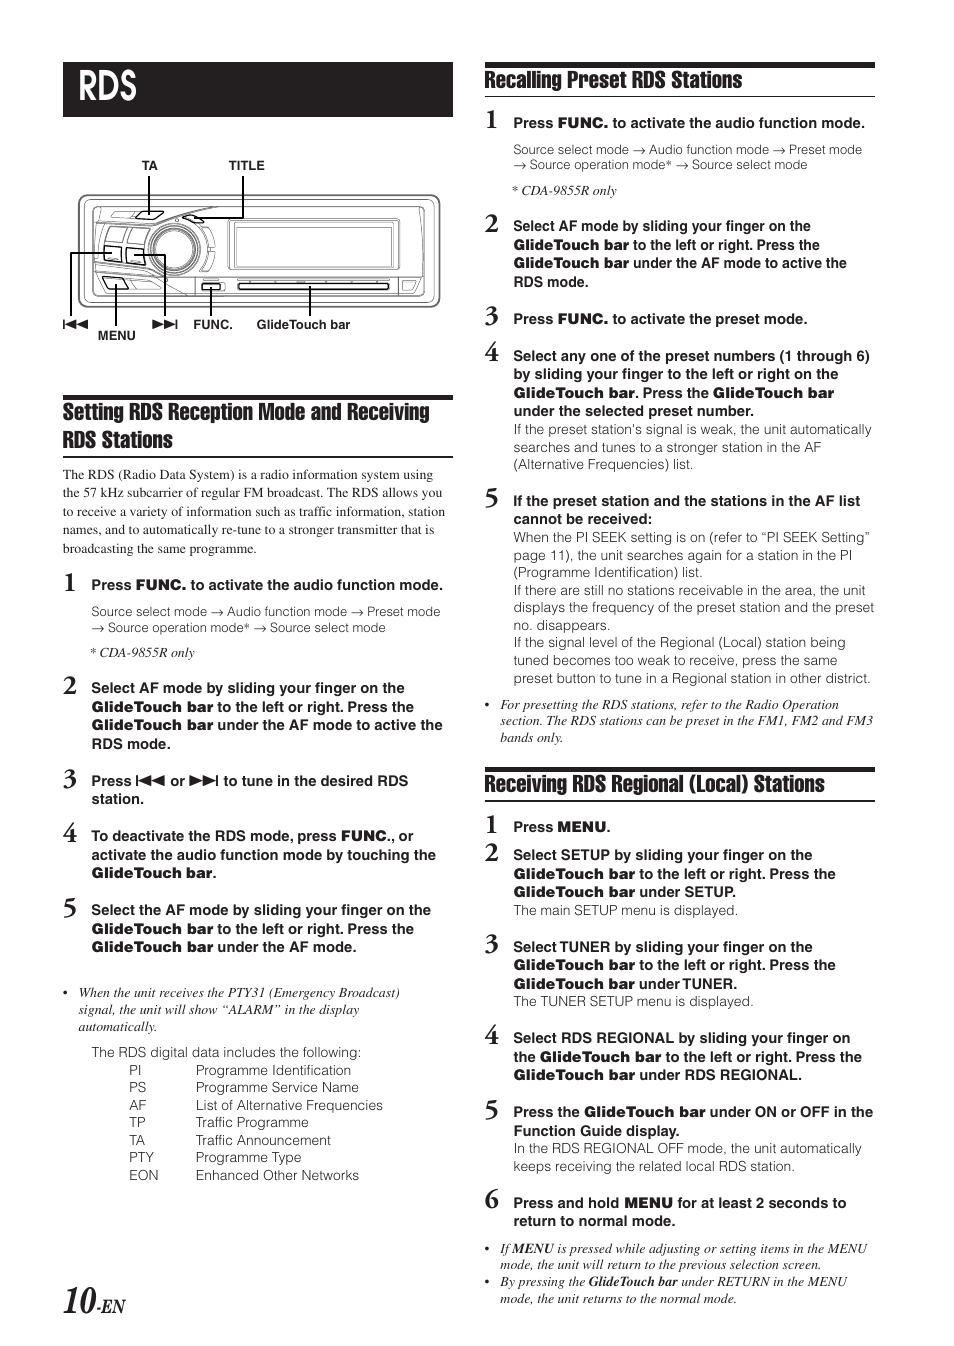 Alpine car stereo system cda-9853r user guide | manualsonline.